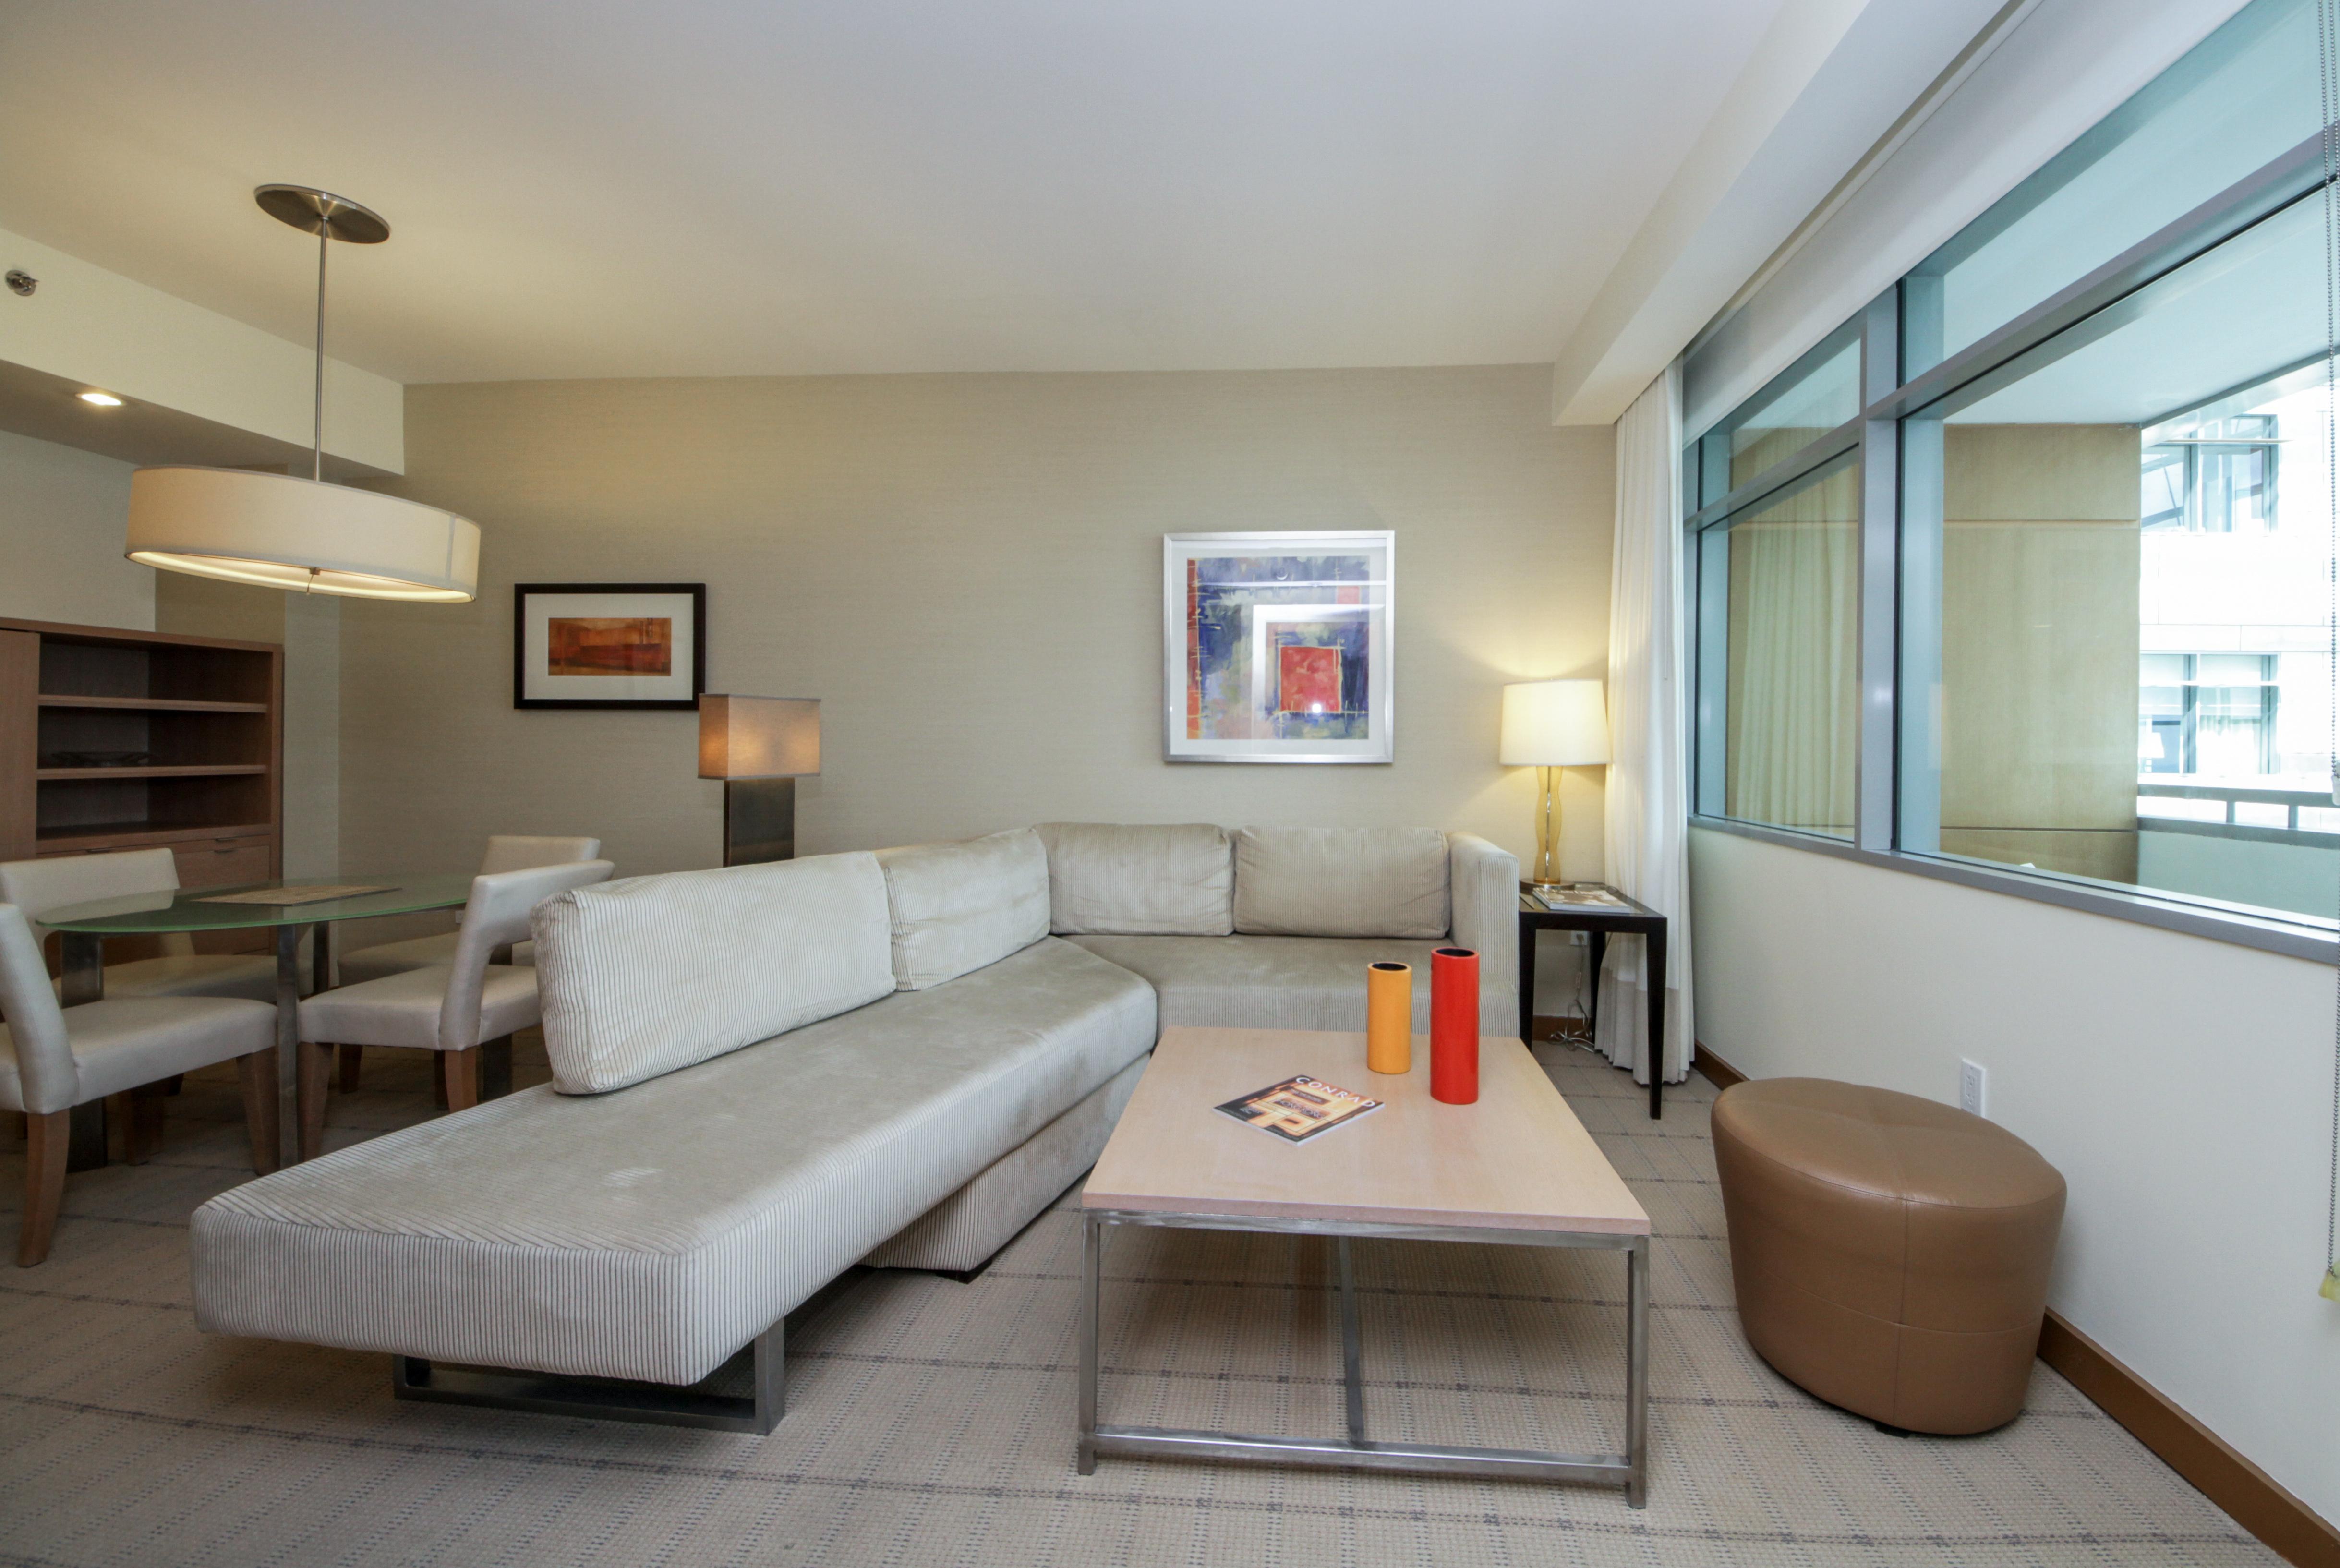 Condominium for Sale at 1395 Brickell Ave #3310 1395 Brickell Ave 3310 Miami, Florida, 33131 United States